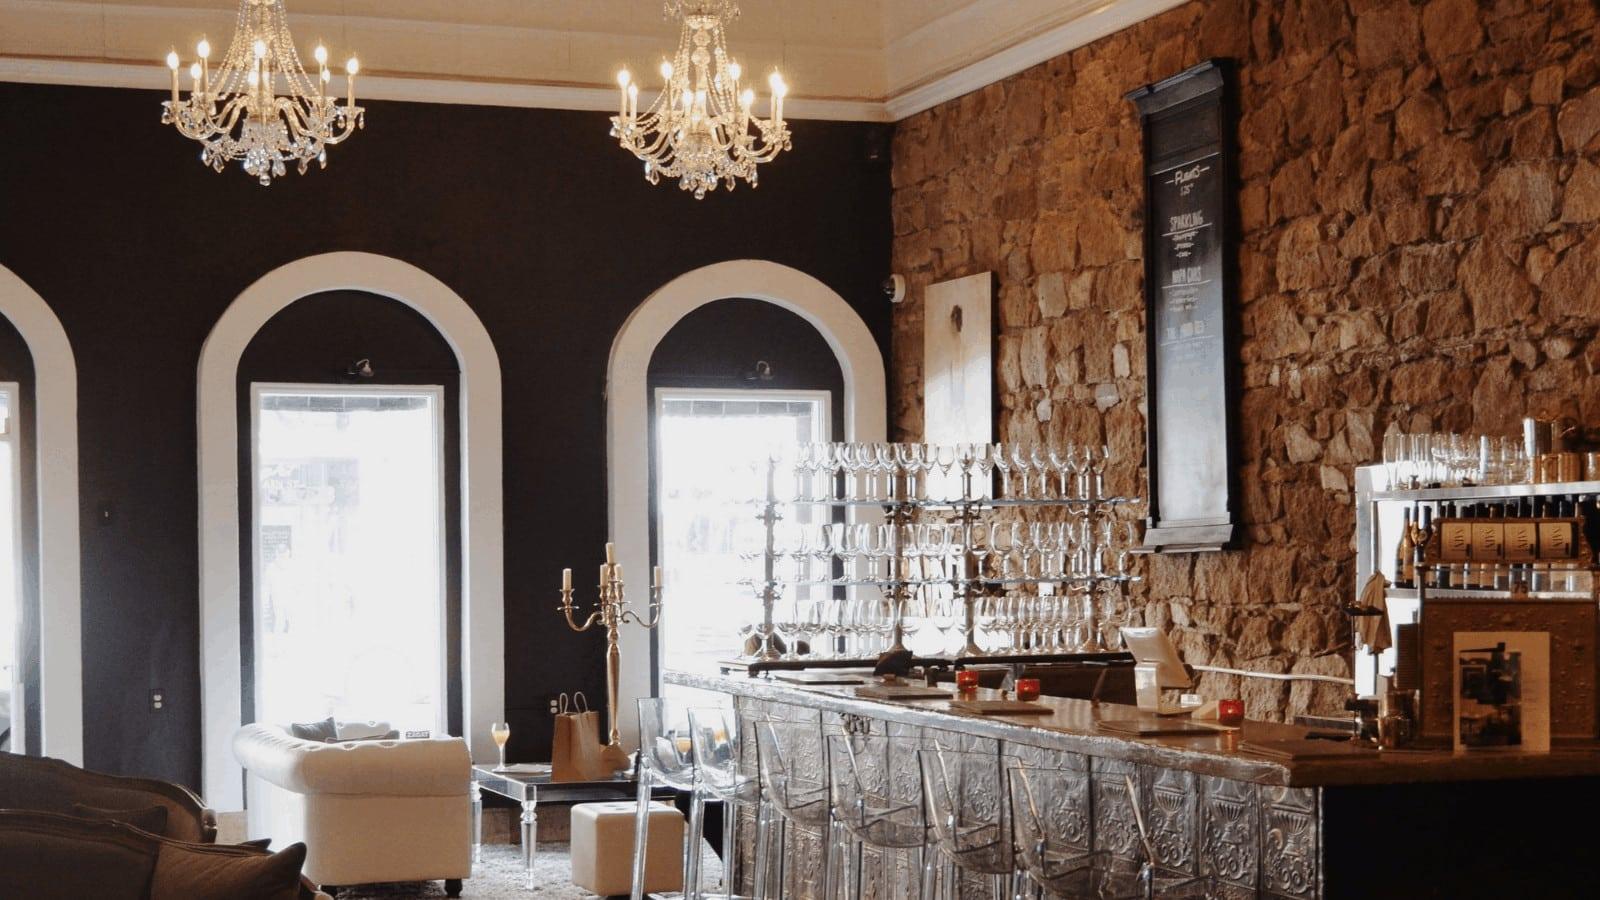 The Saint Wine Lounge